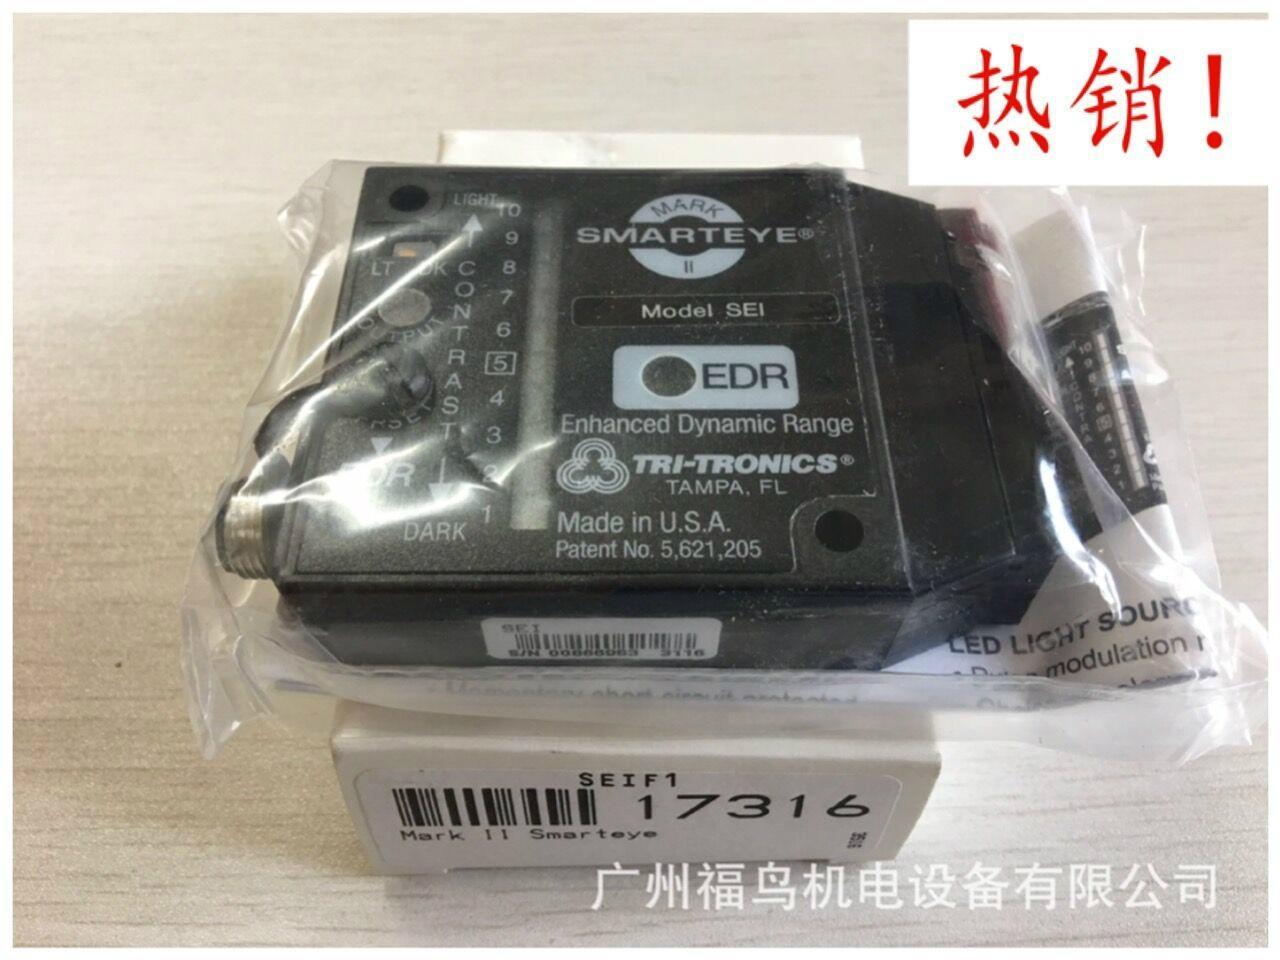 TRI-TRONICS光電開關, 傳感器, 型號: SEIF1